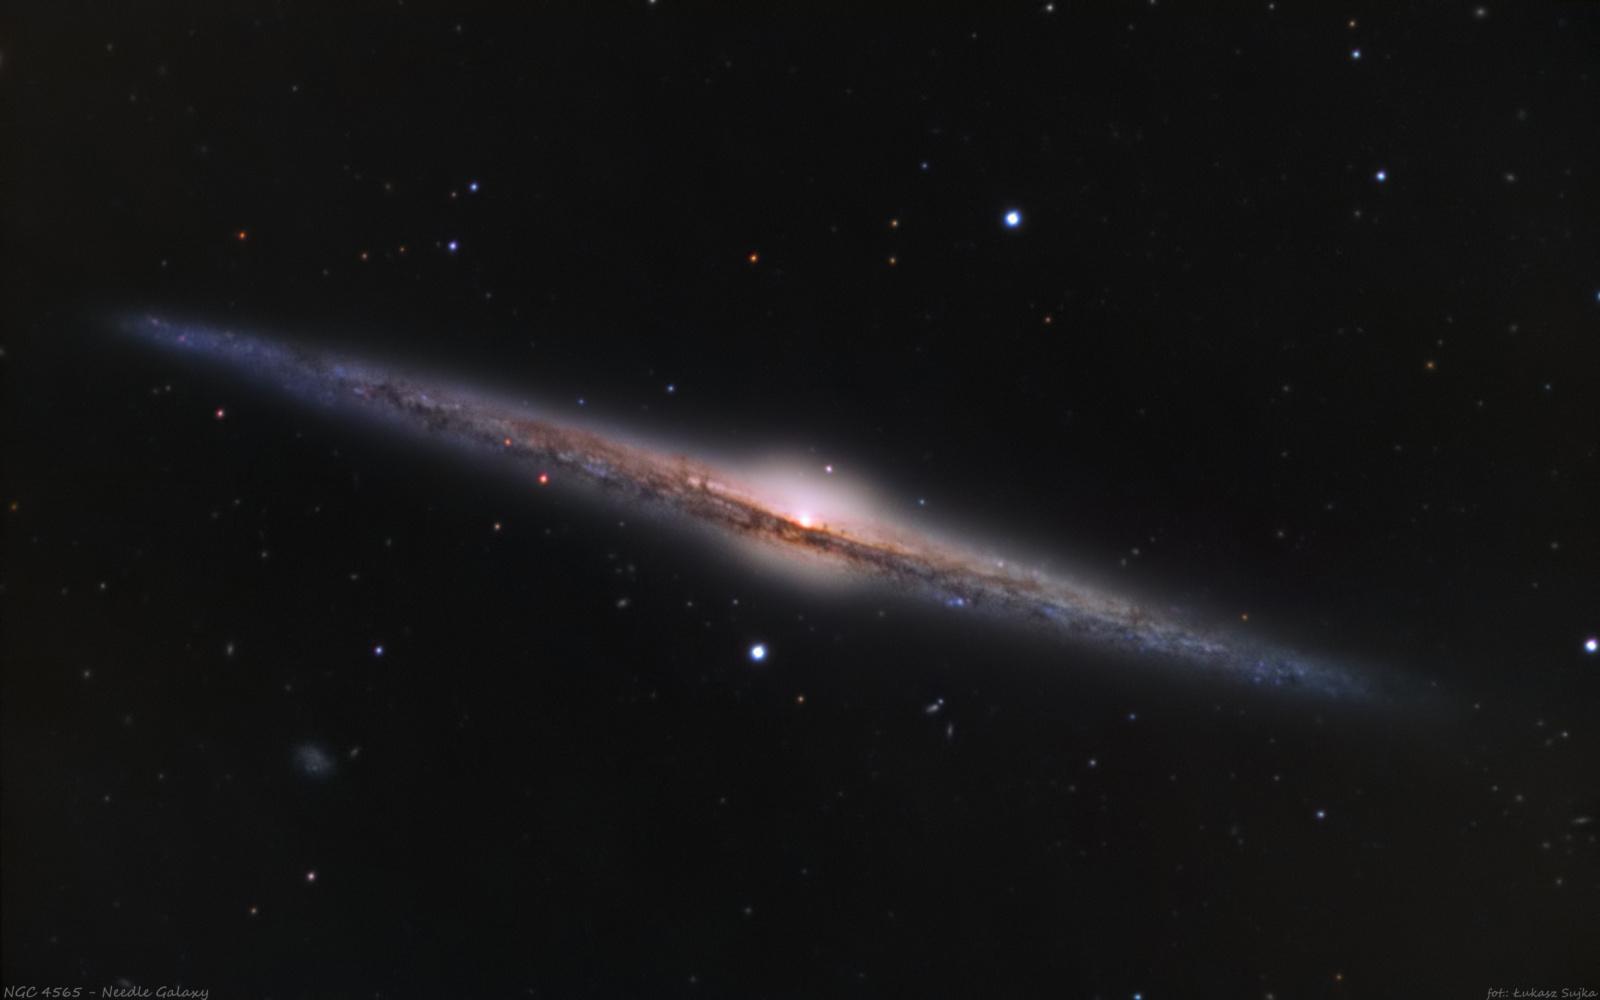 146120036_NGC4565col80prdenoised.thumb.jpg.91d31b3778e111385a594200d9d78d56.jpg